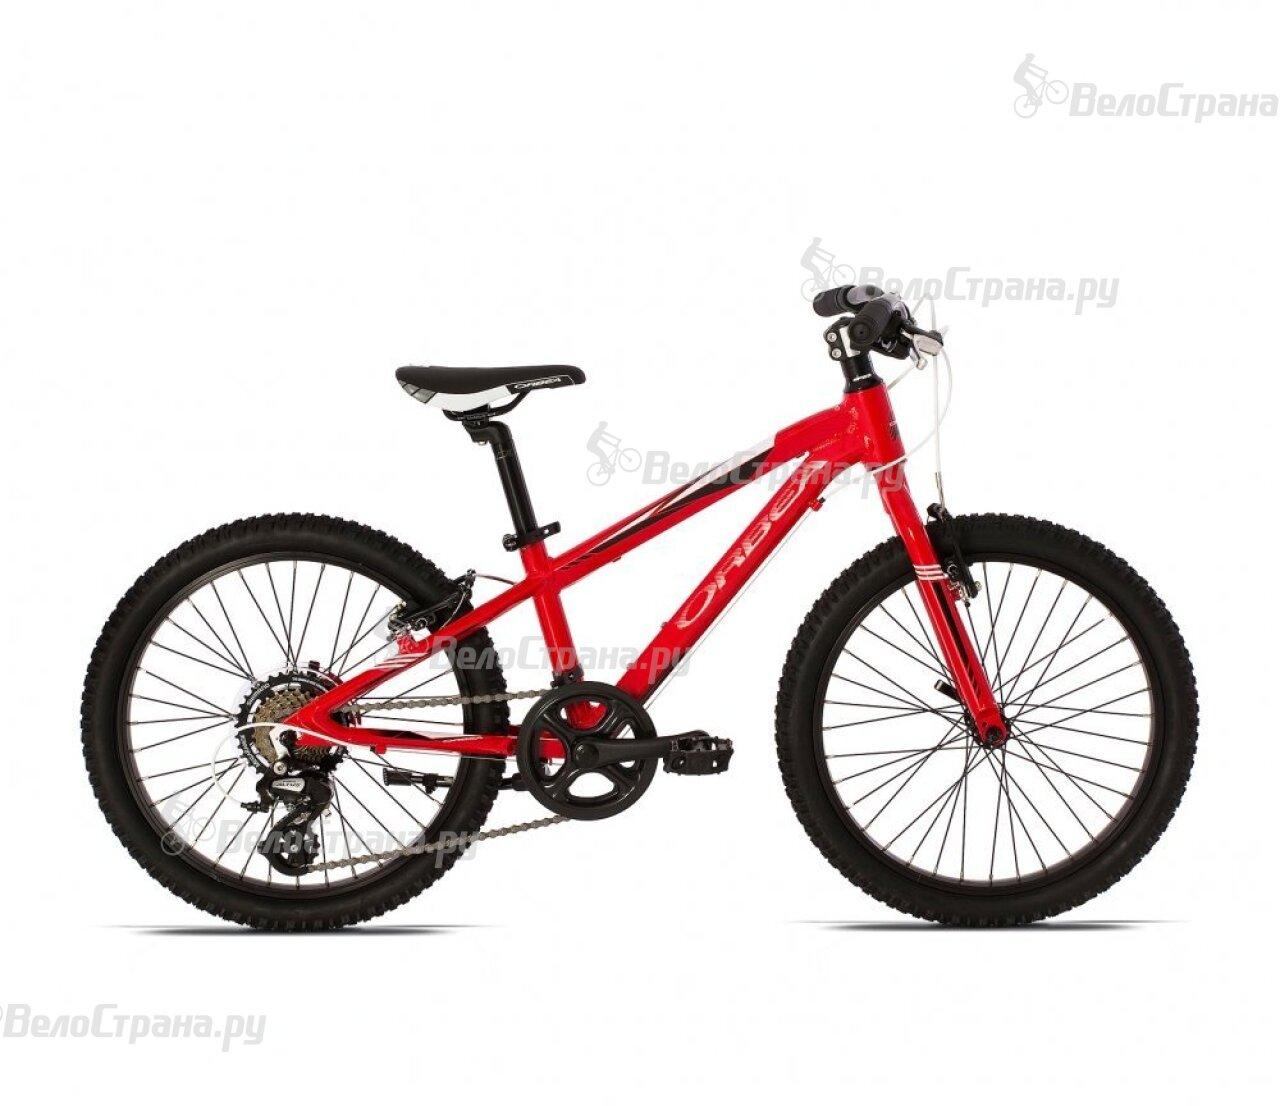 все цены на Велосипед Orbea Mx 20 Dirt (2014) онлайн